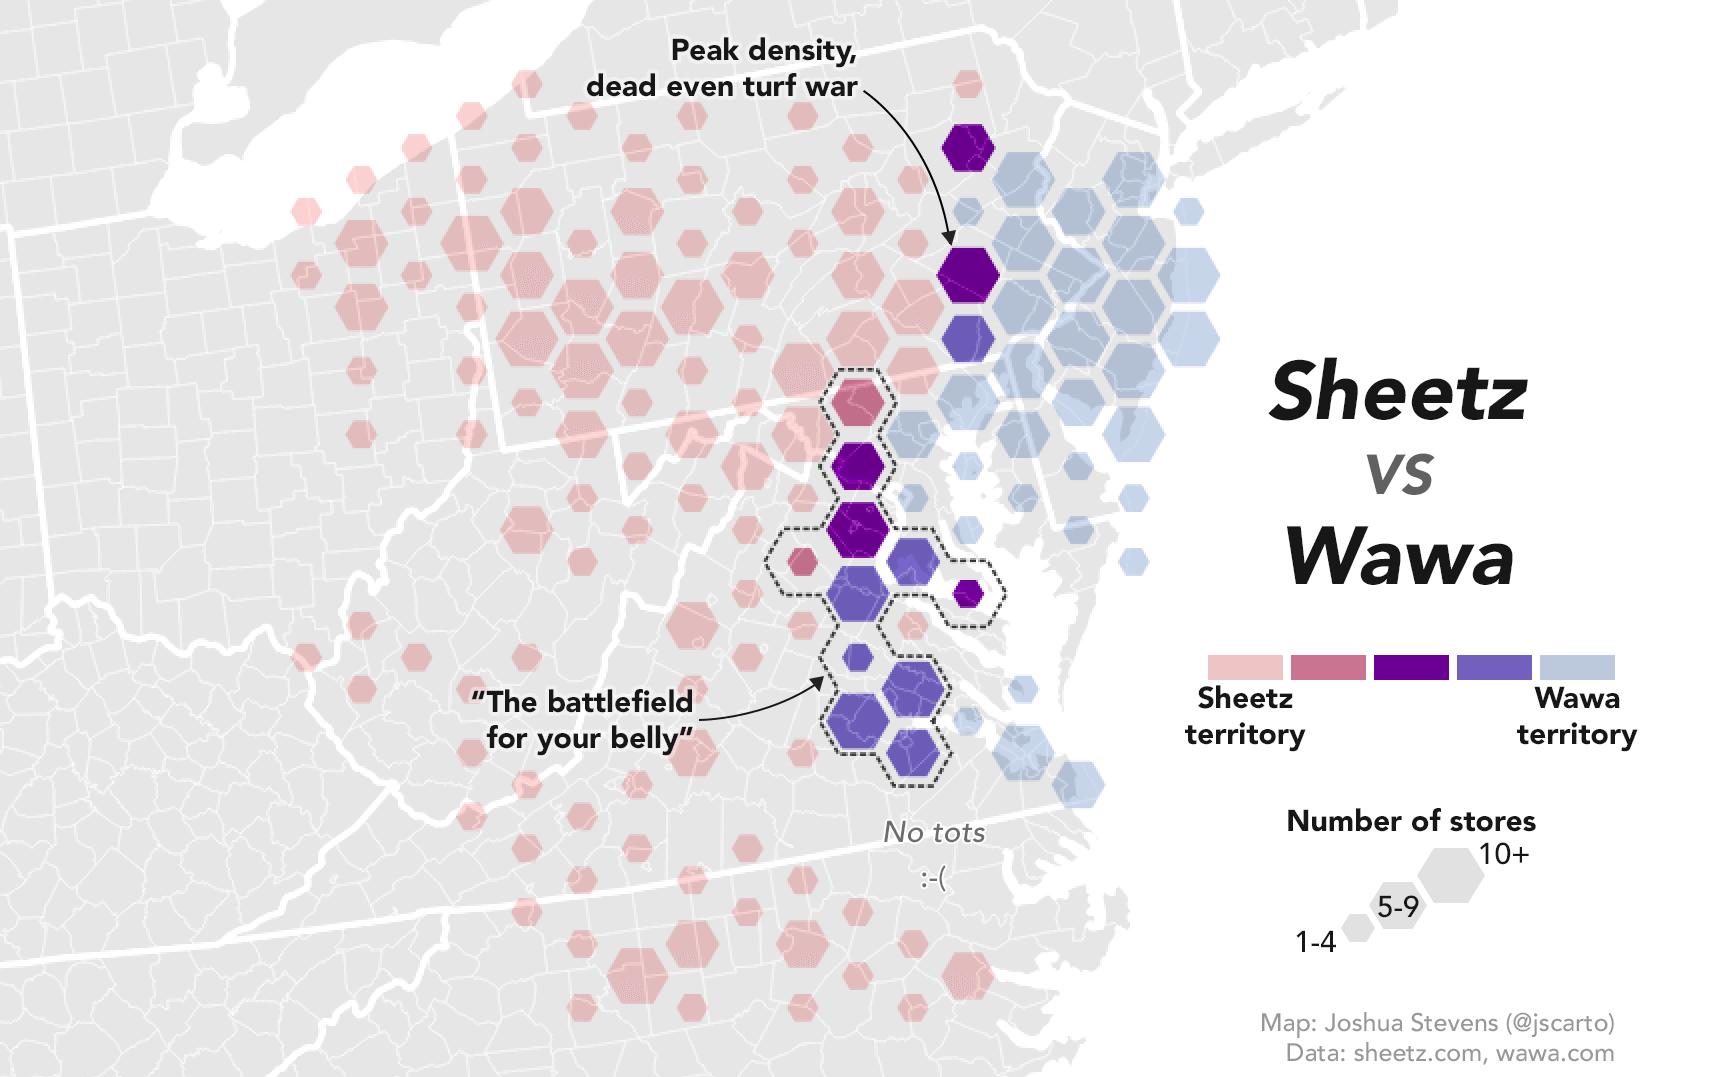 NASA Cartographer Weighs in on Wawa/Sheetz Turf War with a Twitter Map